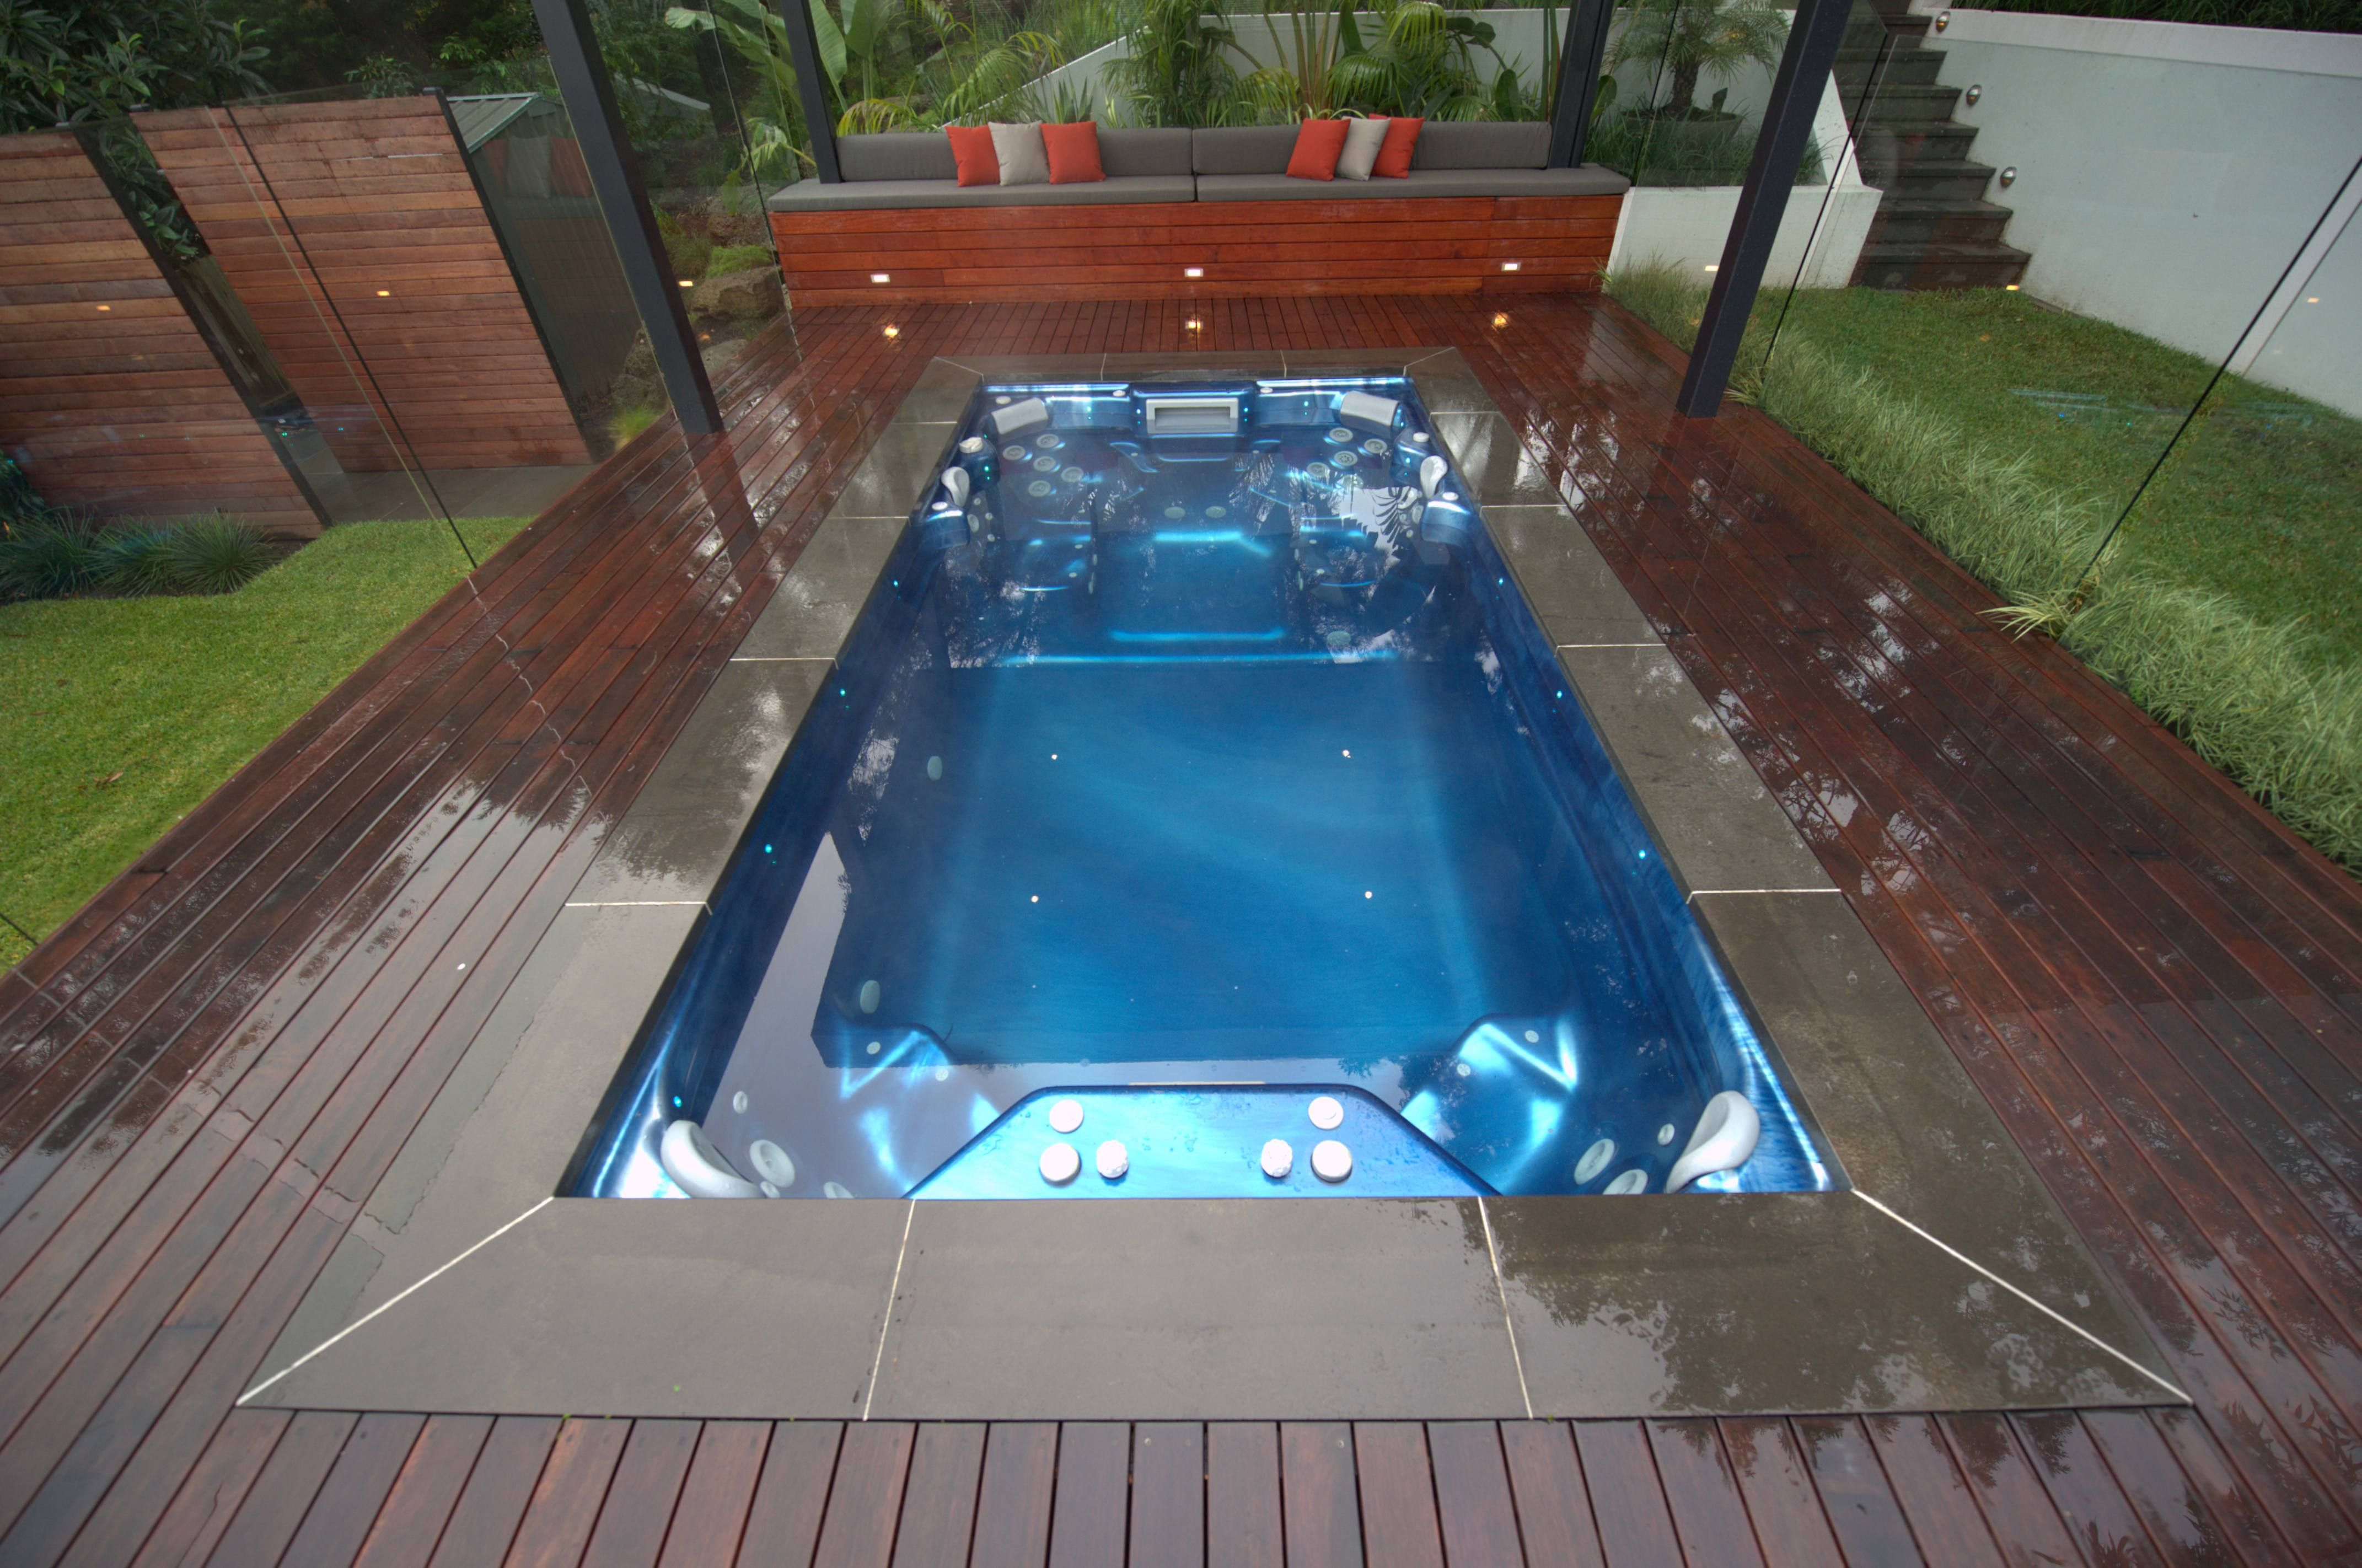 Best in Situ Portable Swim Spa 2013 | exteriors | Pinterest | Spa ...